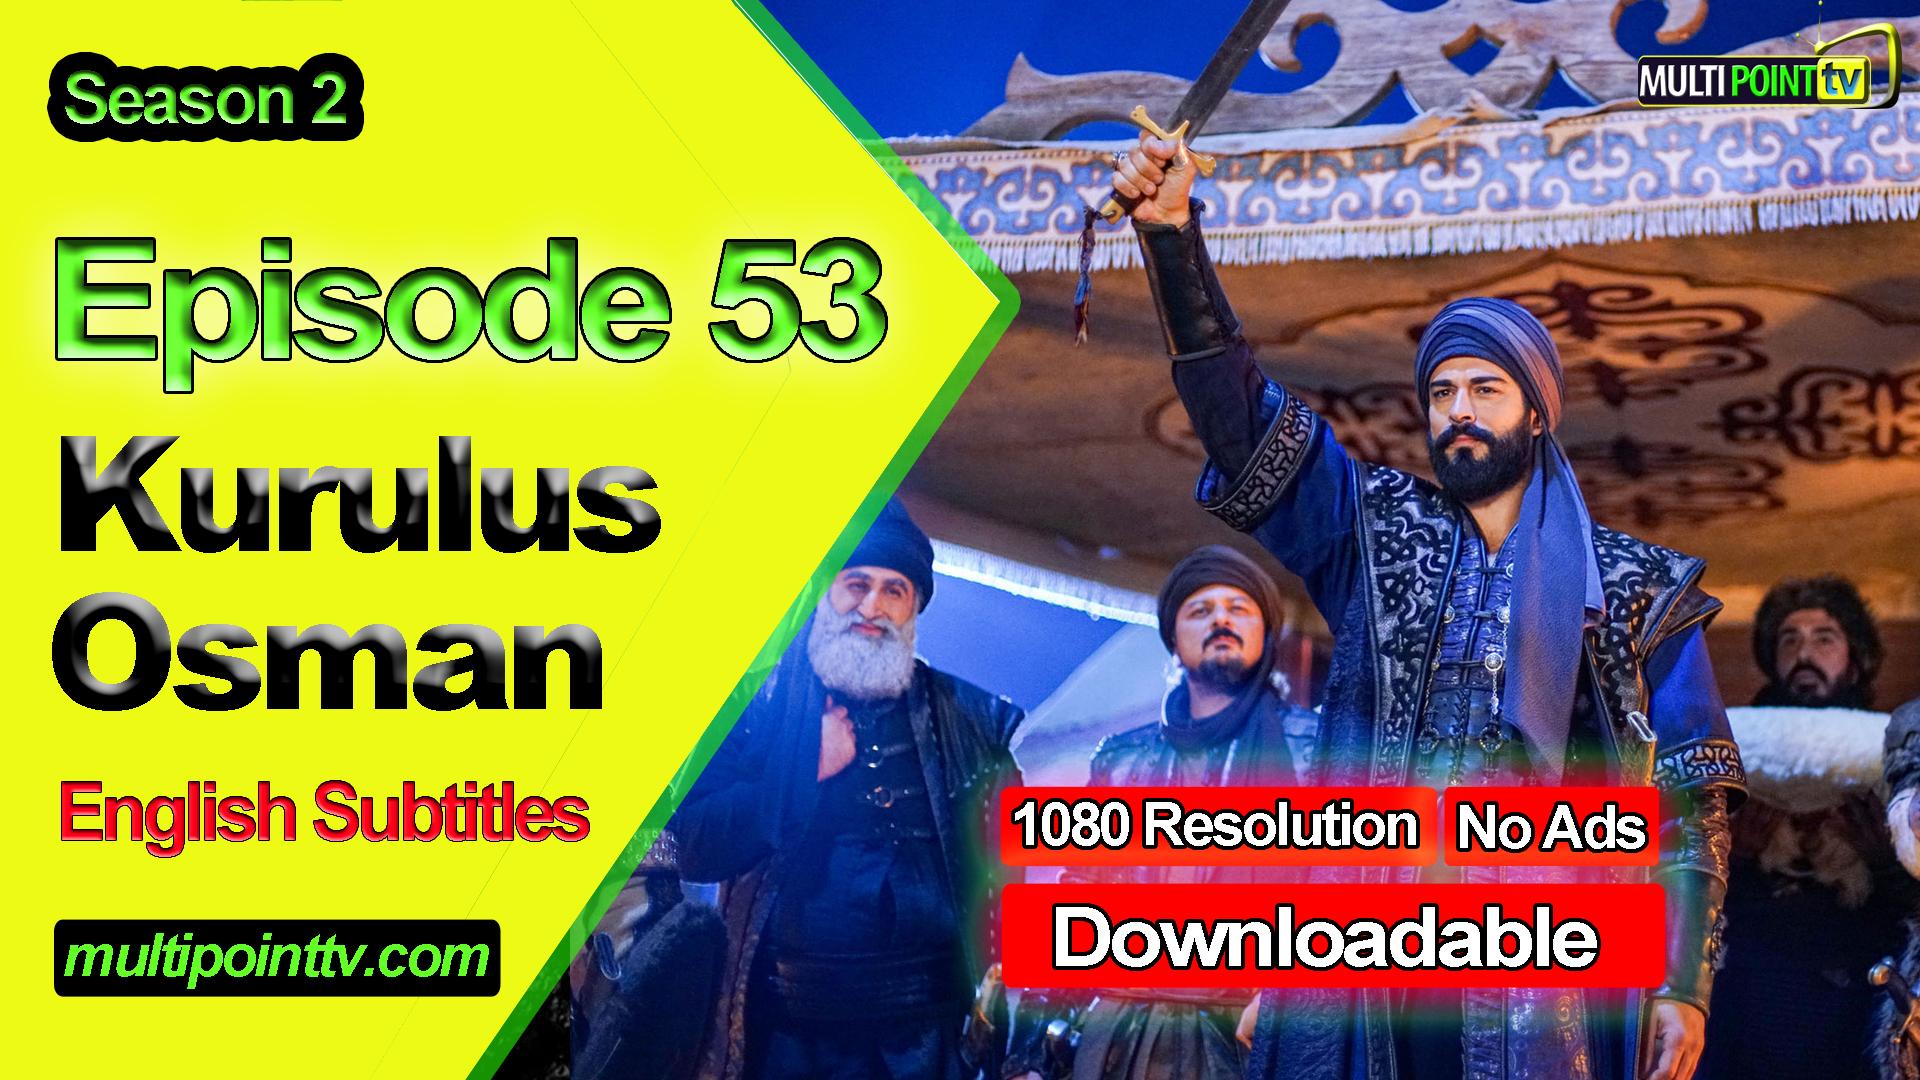 Kurulus Osman Episode 53 English Subtitles